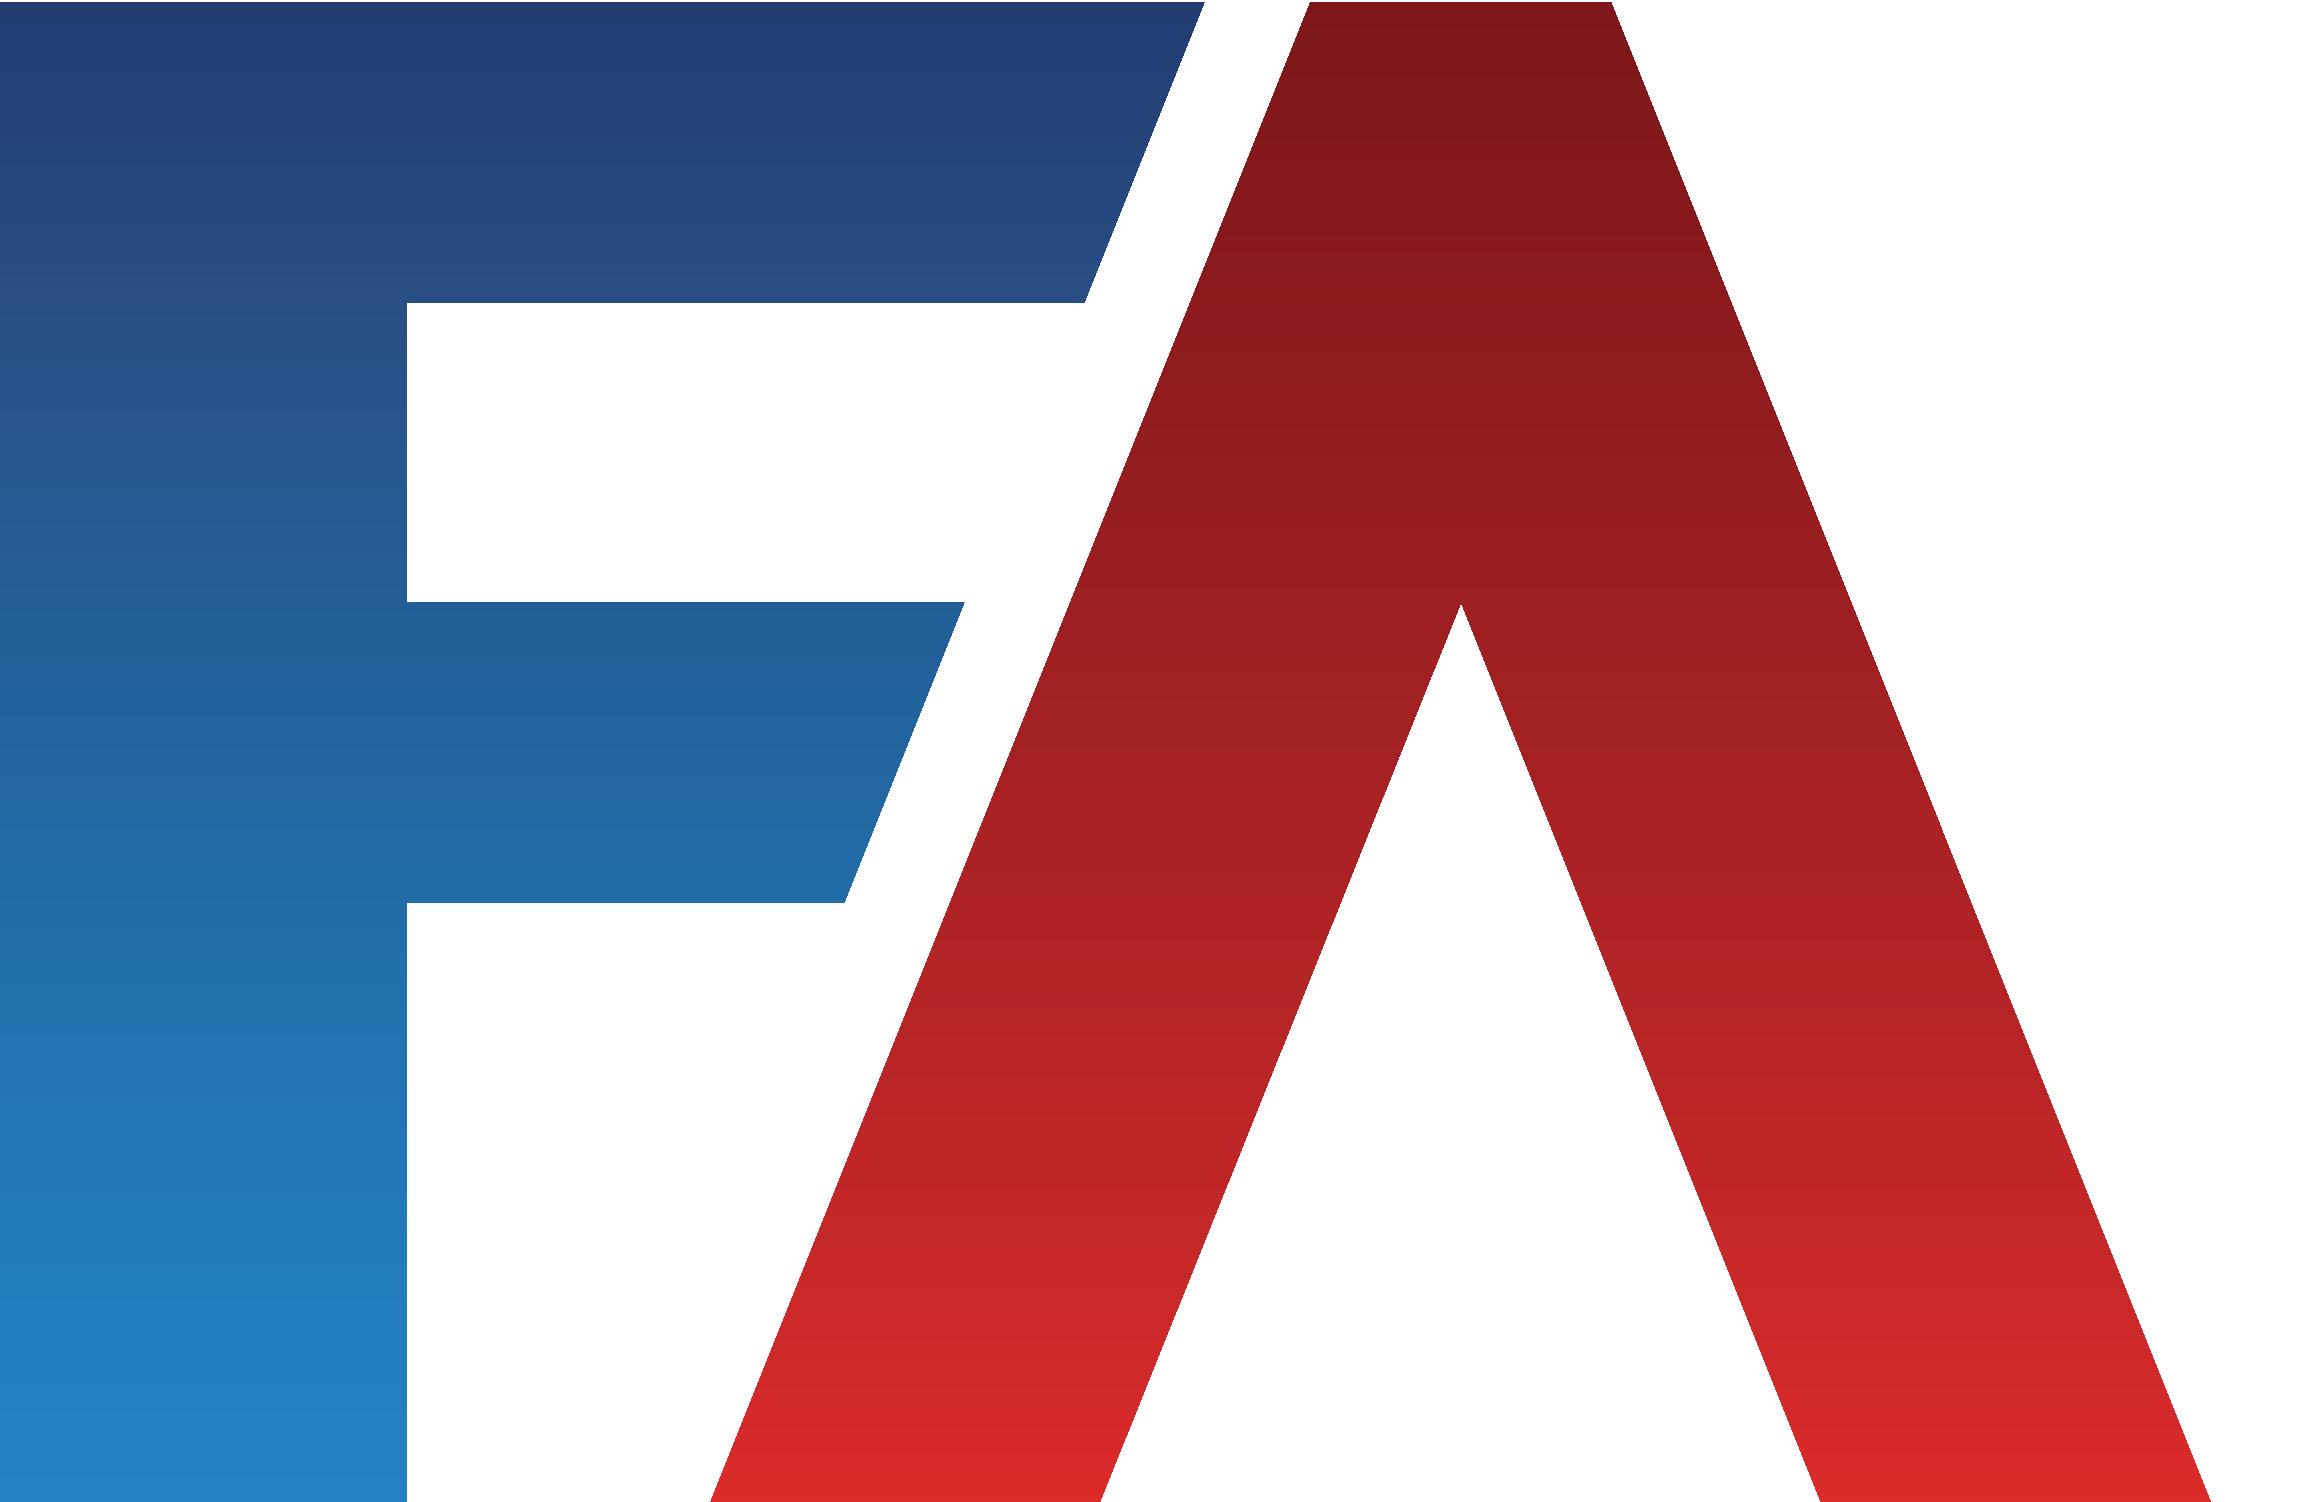 Evan Longoria - 3B | FantasyAlarm.com